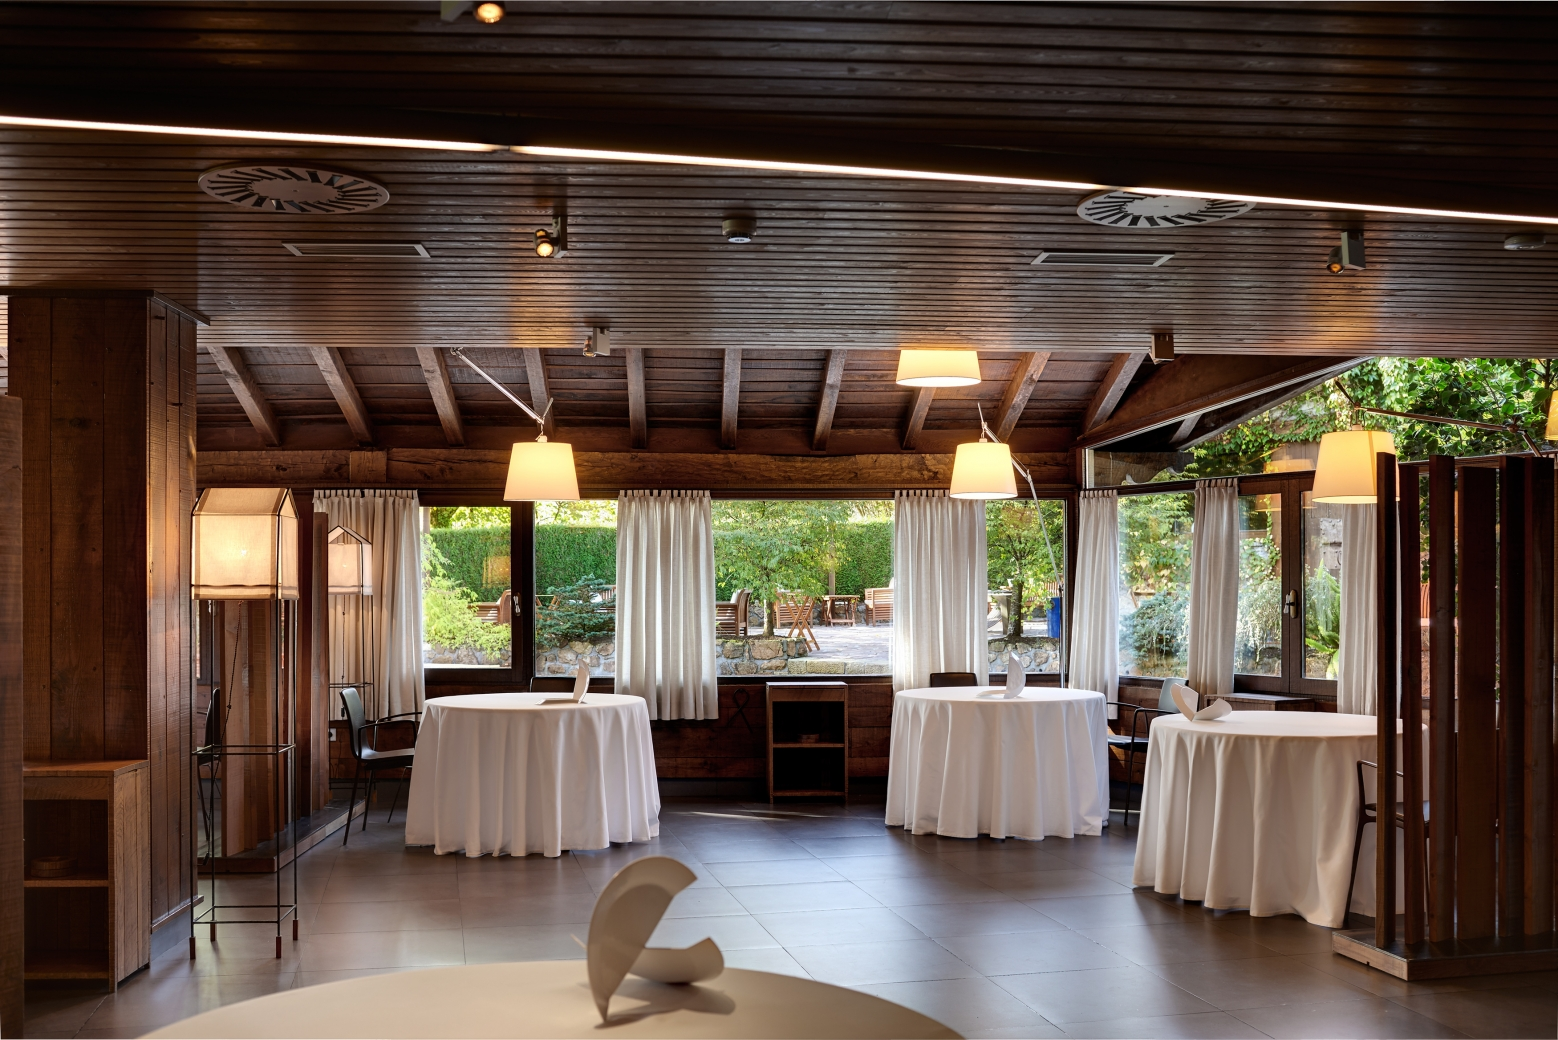 orlds best dressed restaurants - HD1500×1000